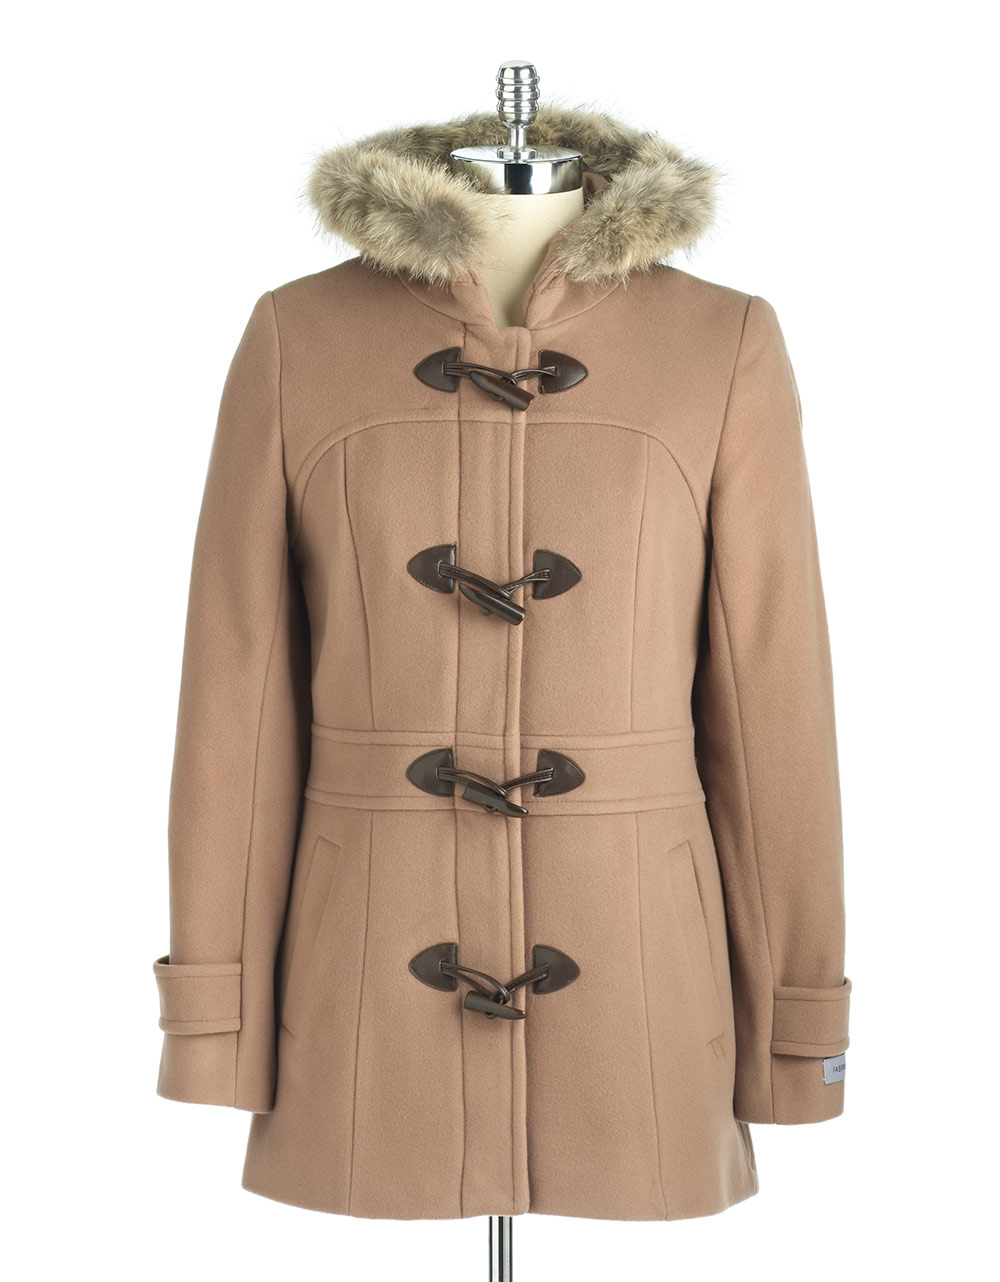 Marc New York Fur Trim Toggle Coat In Beige Camel Lyst